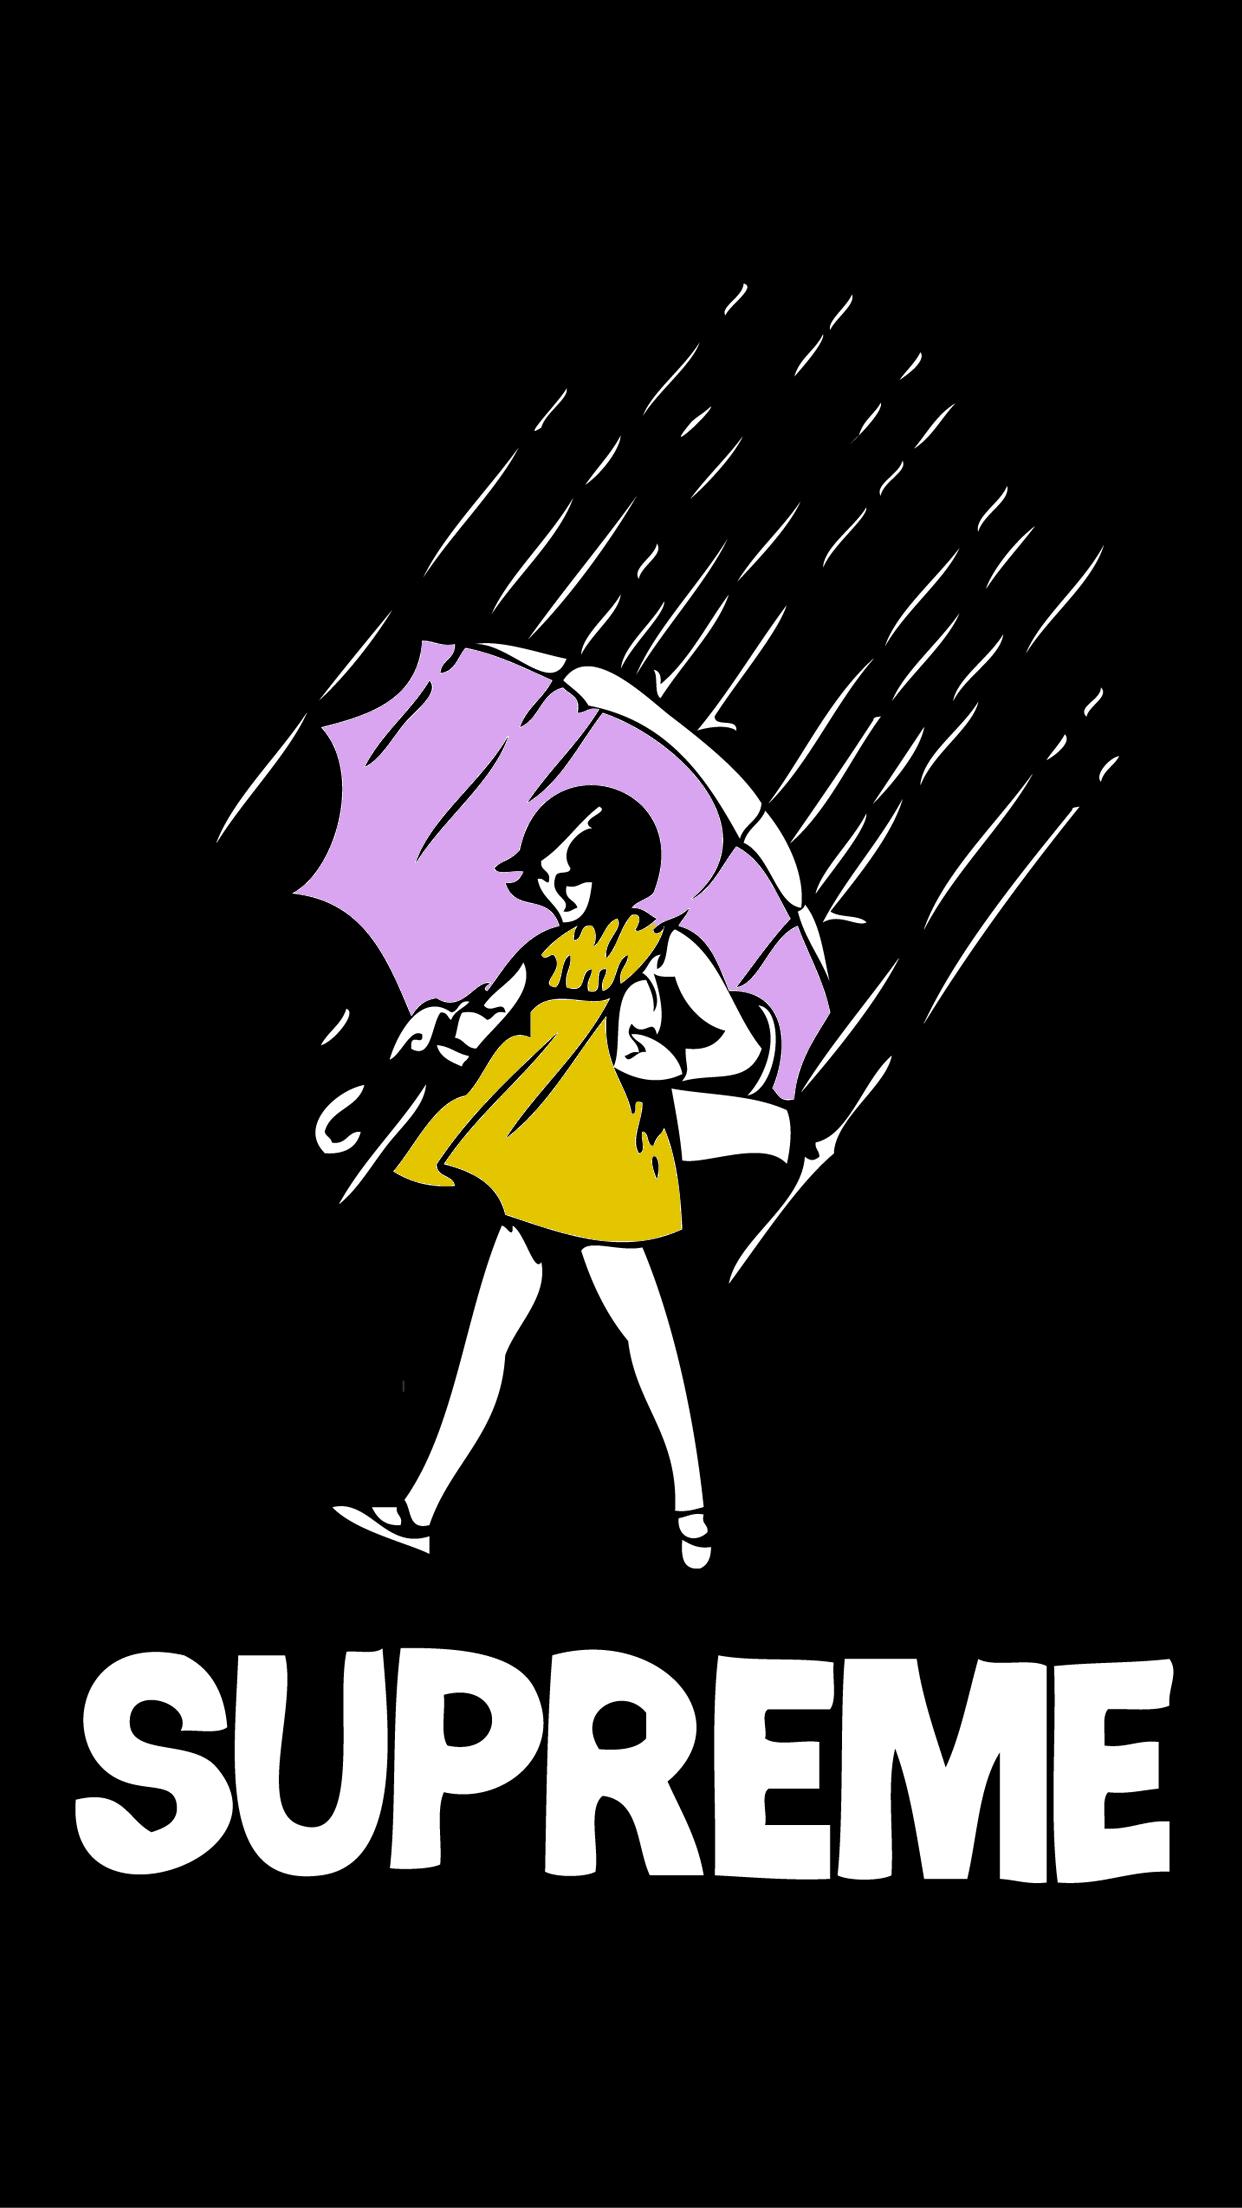 Supreme Wallpaper Bot Supreme Supreme Hd Wallpaper Iphone